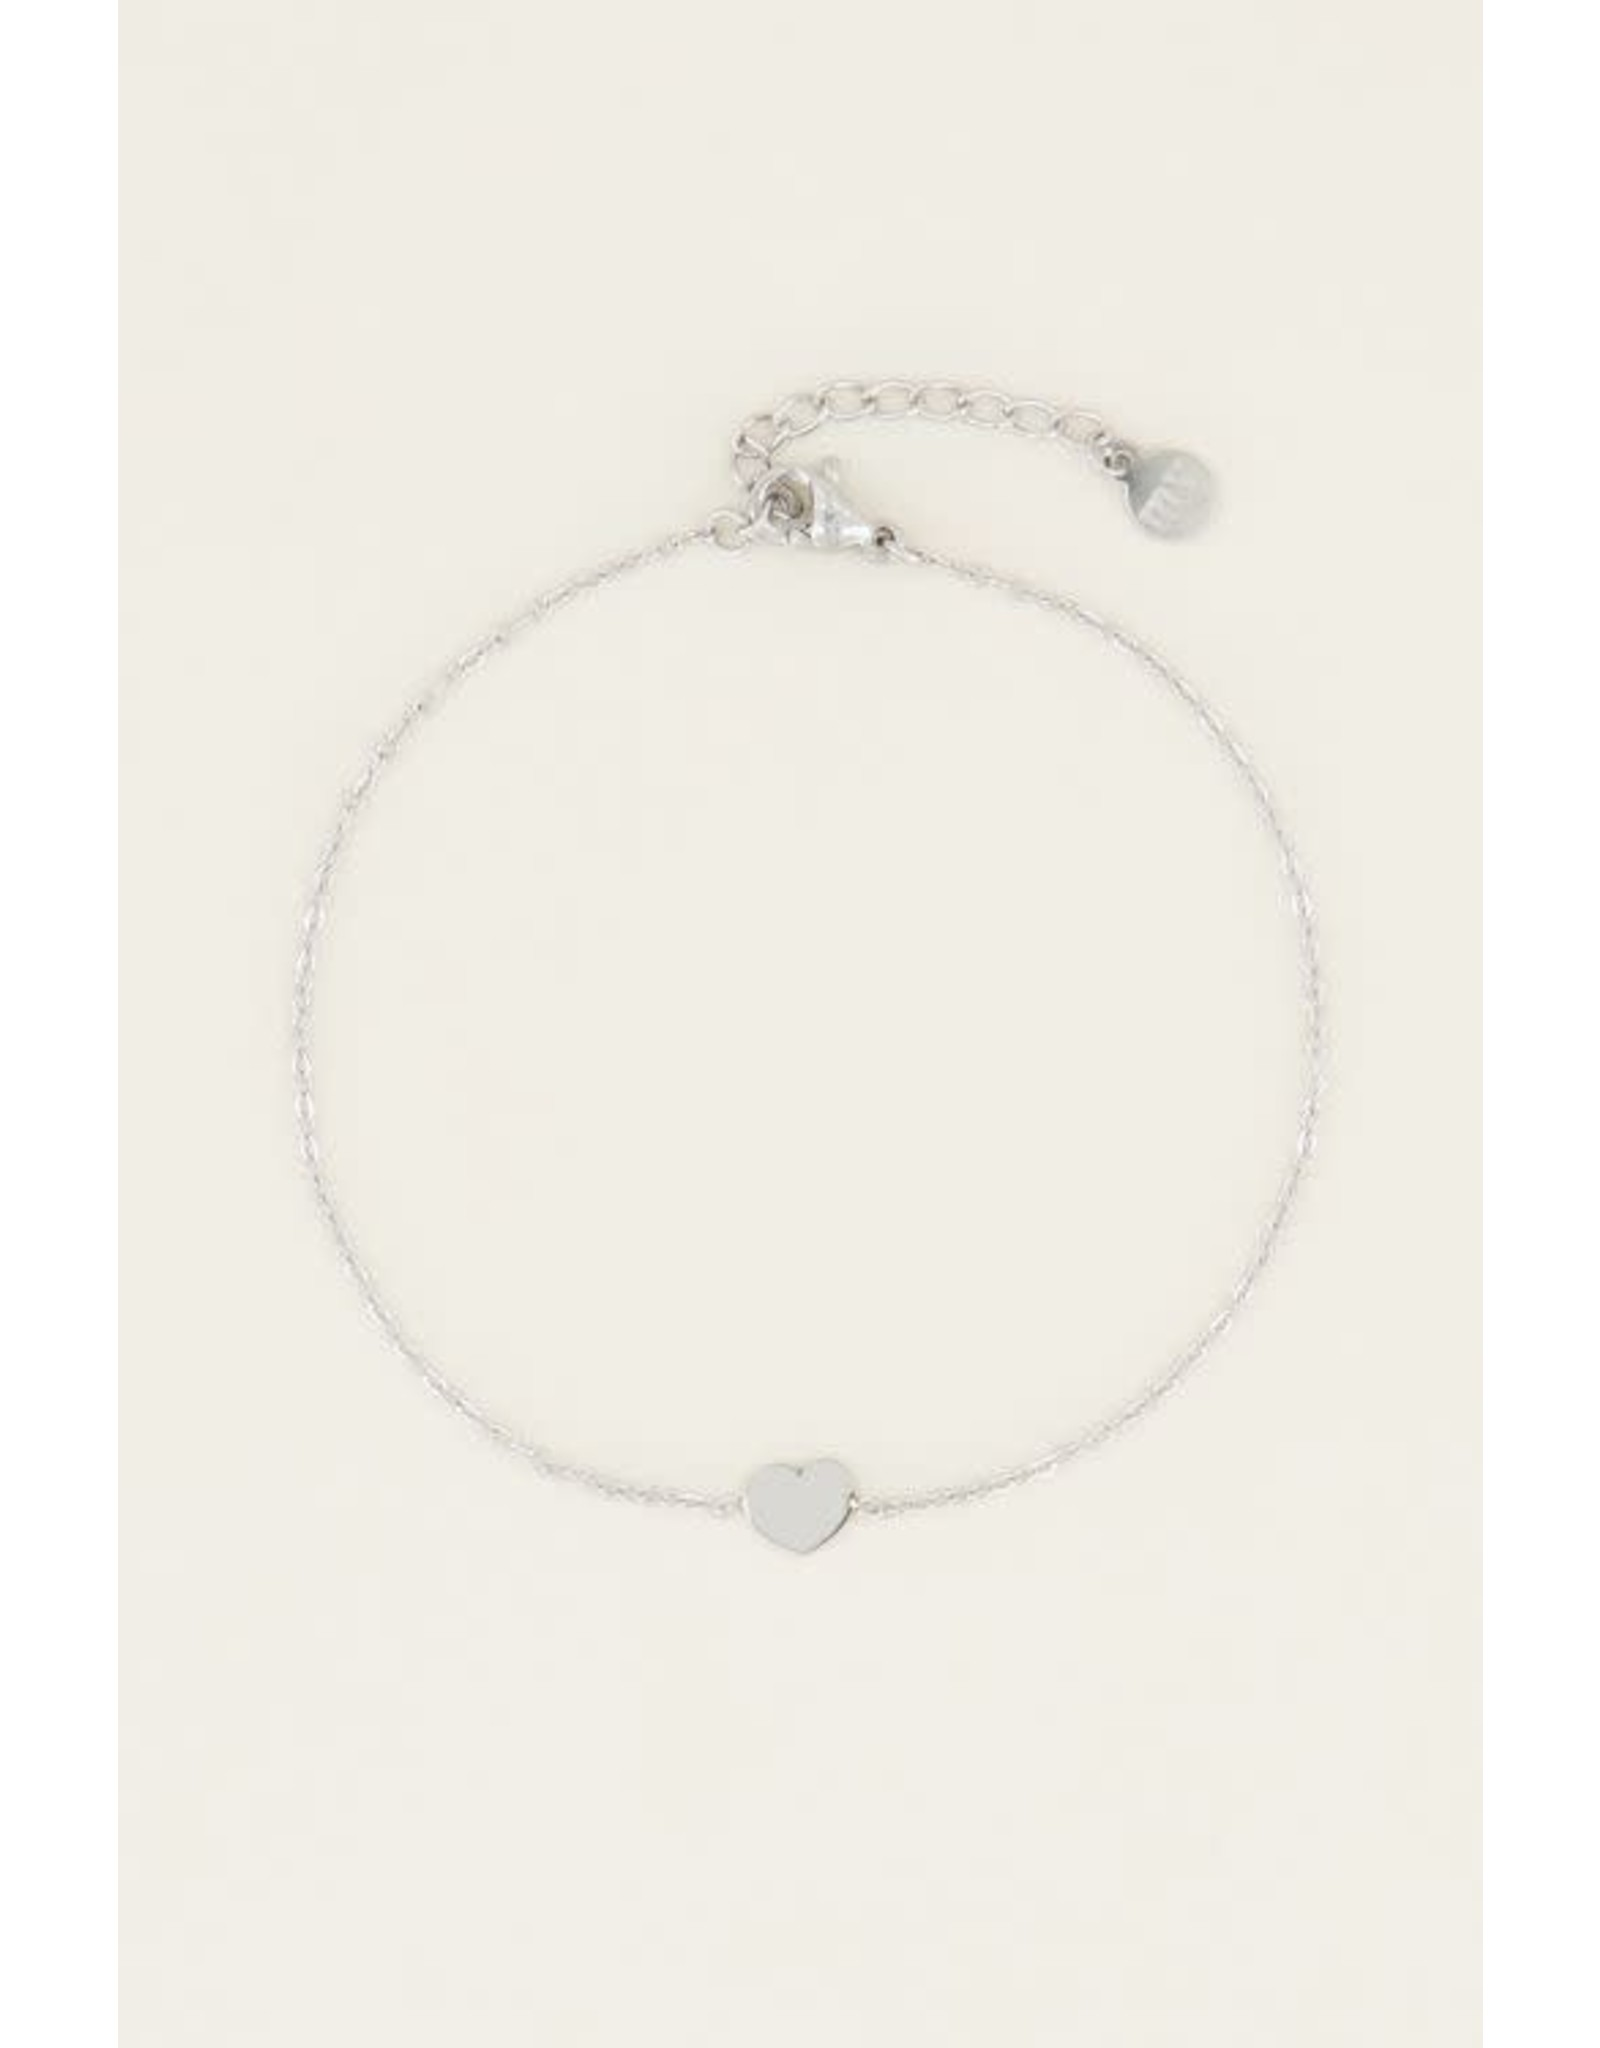 Armband klein hartje zilver